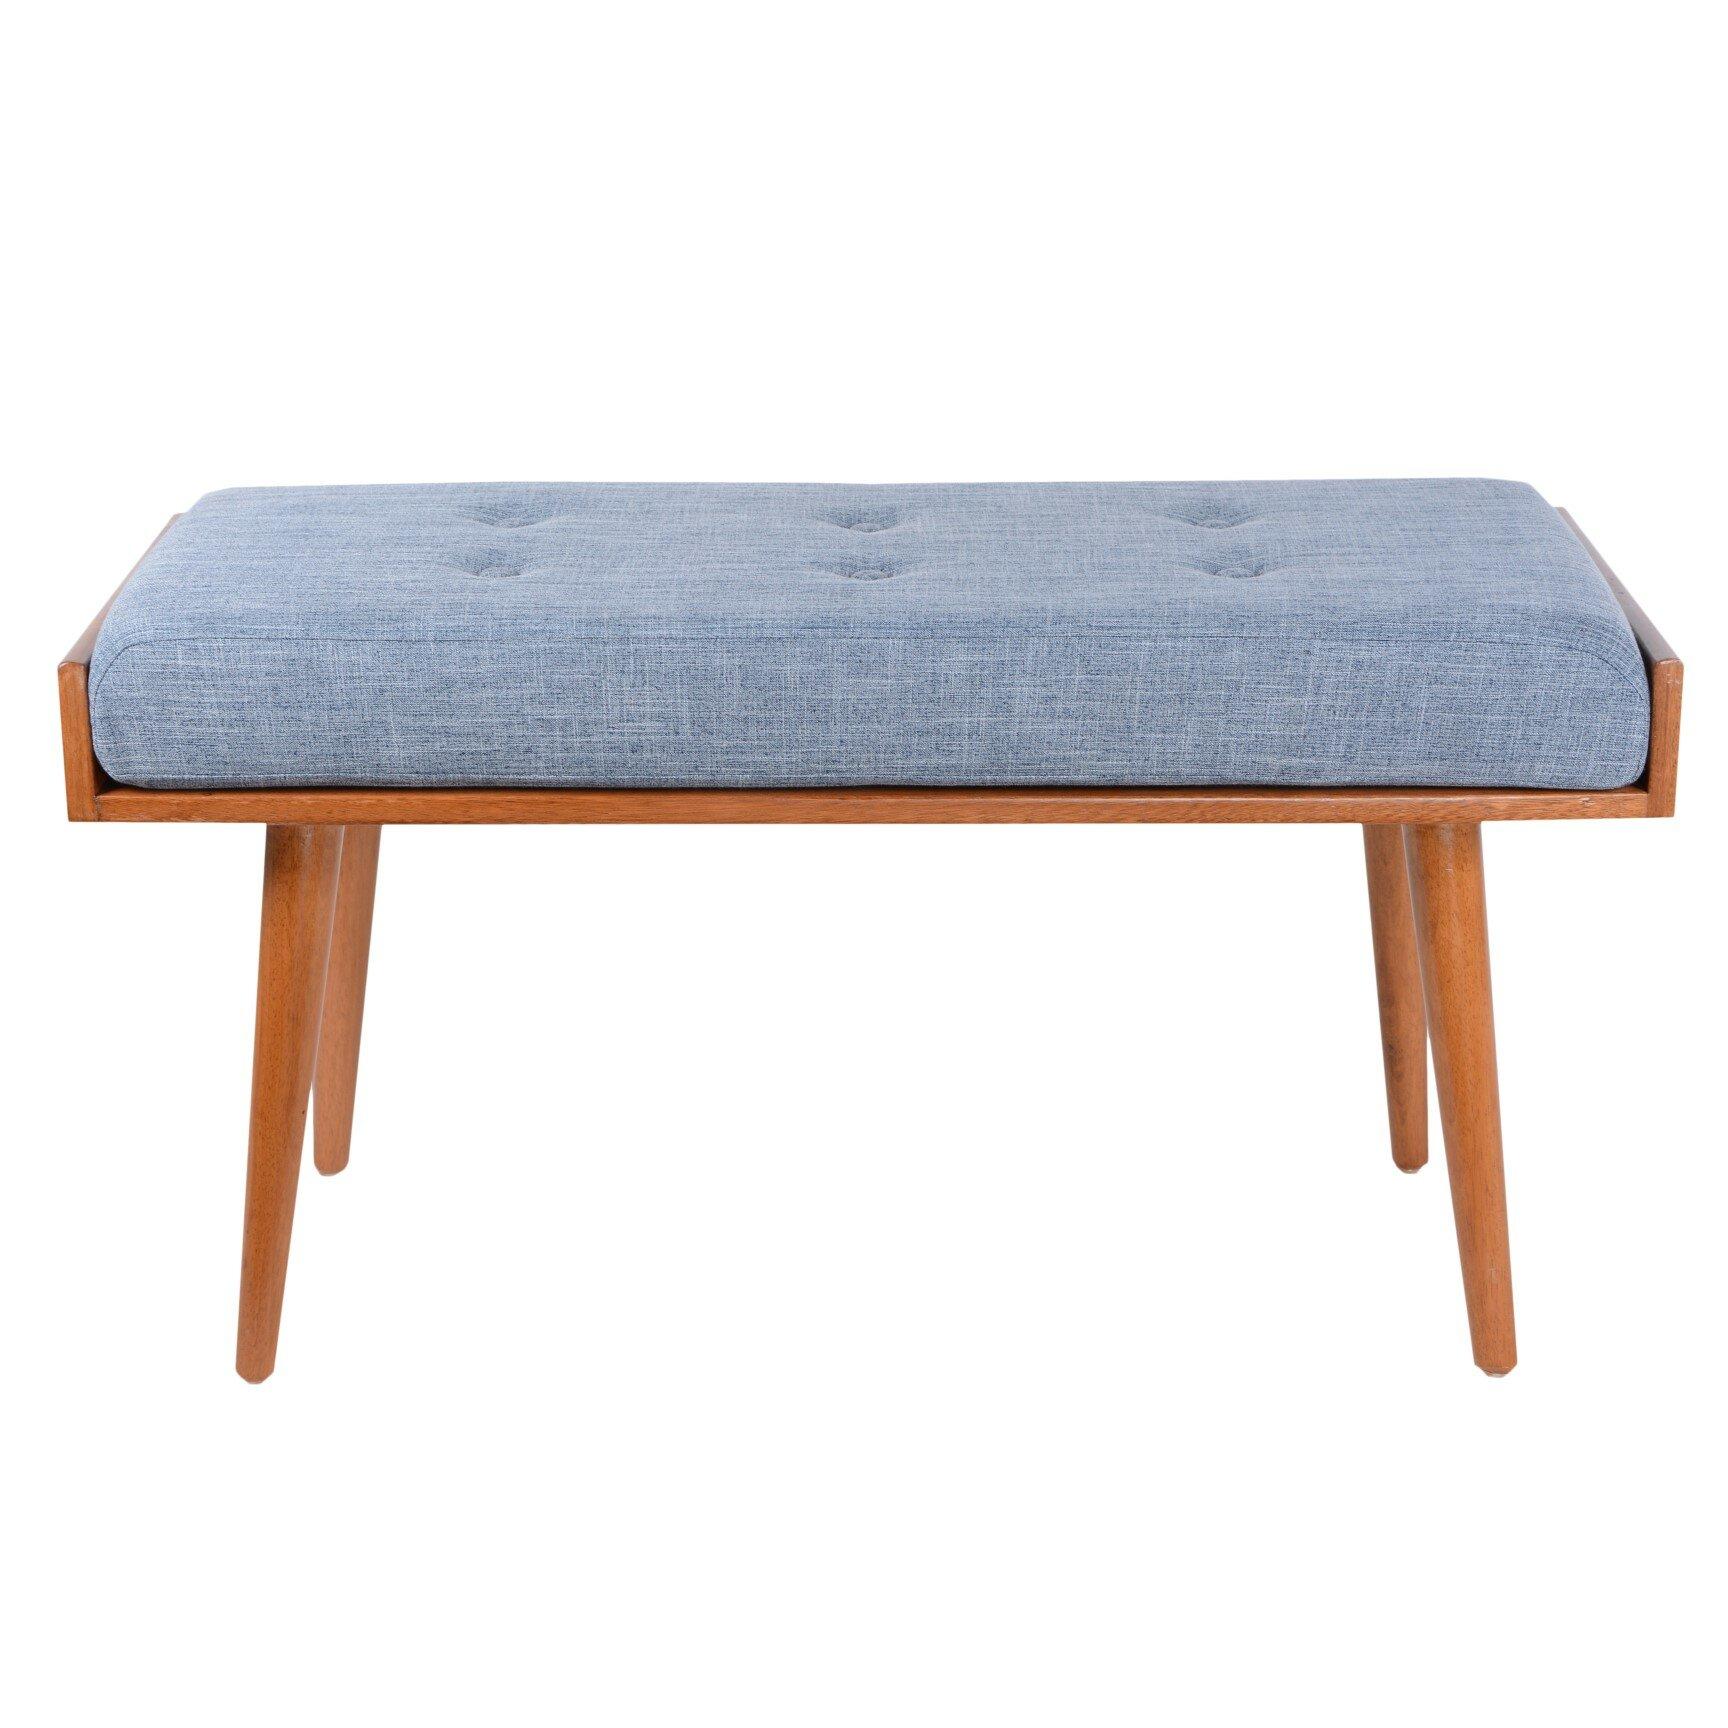 Porthos Home Robin Wood Bench & Reviews | Wayfair